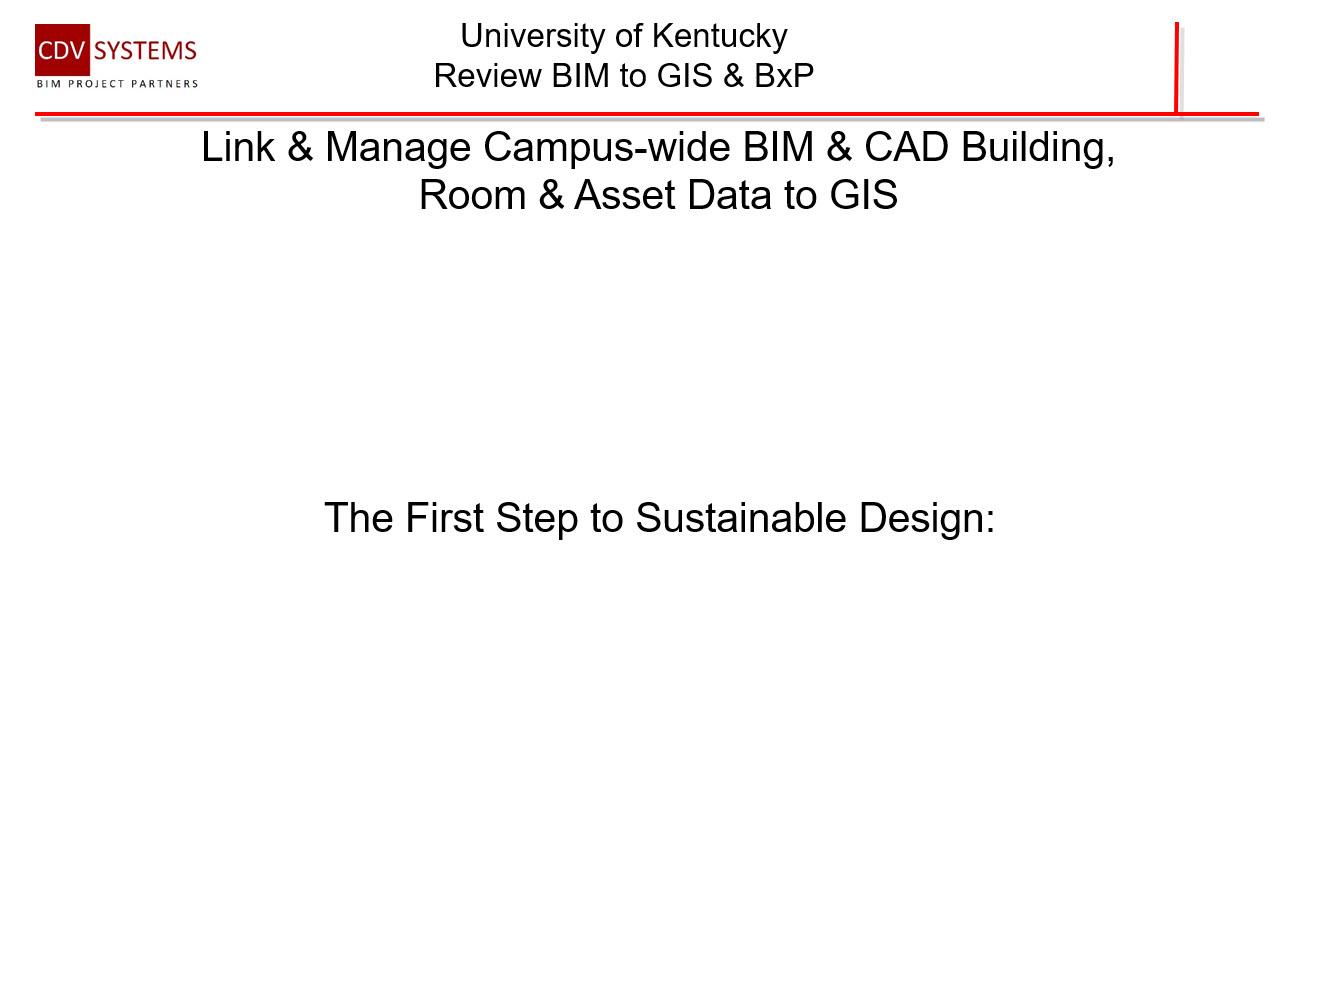 University of Kentucky_003.jpg